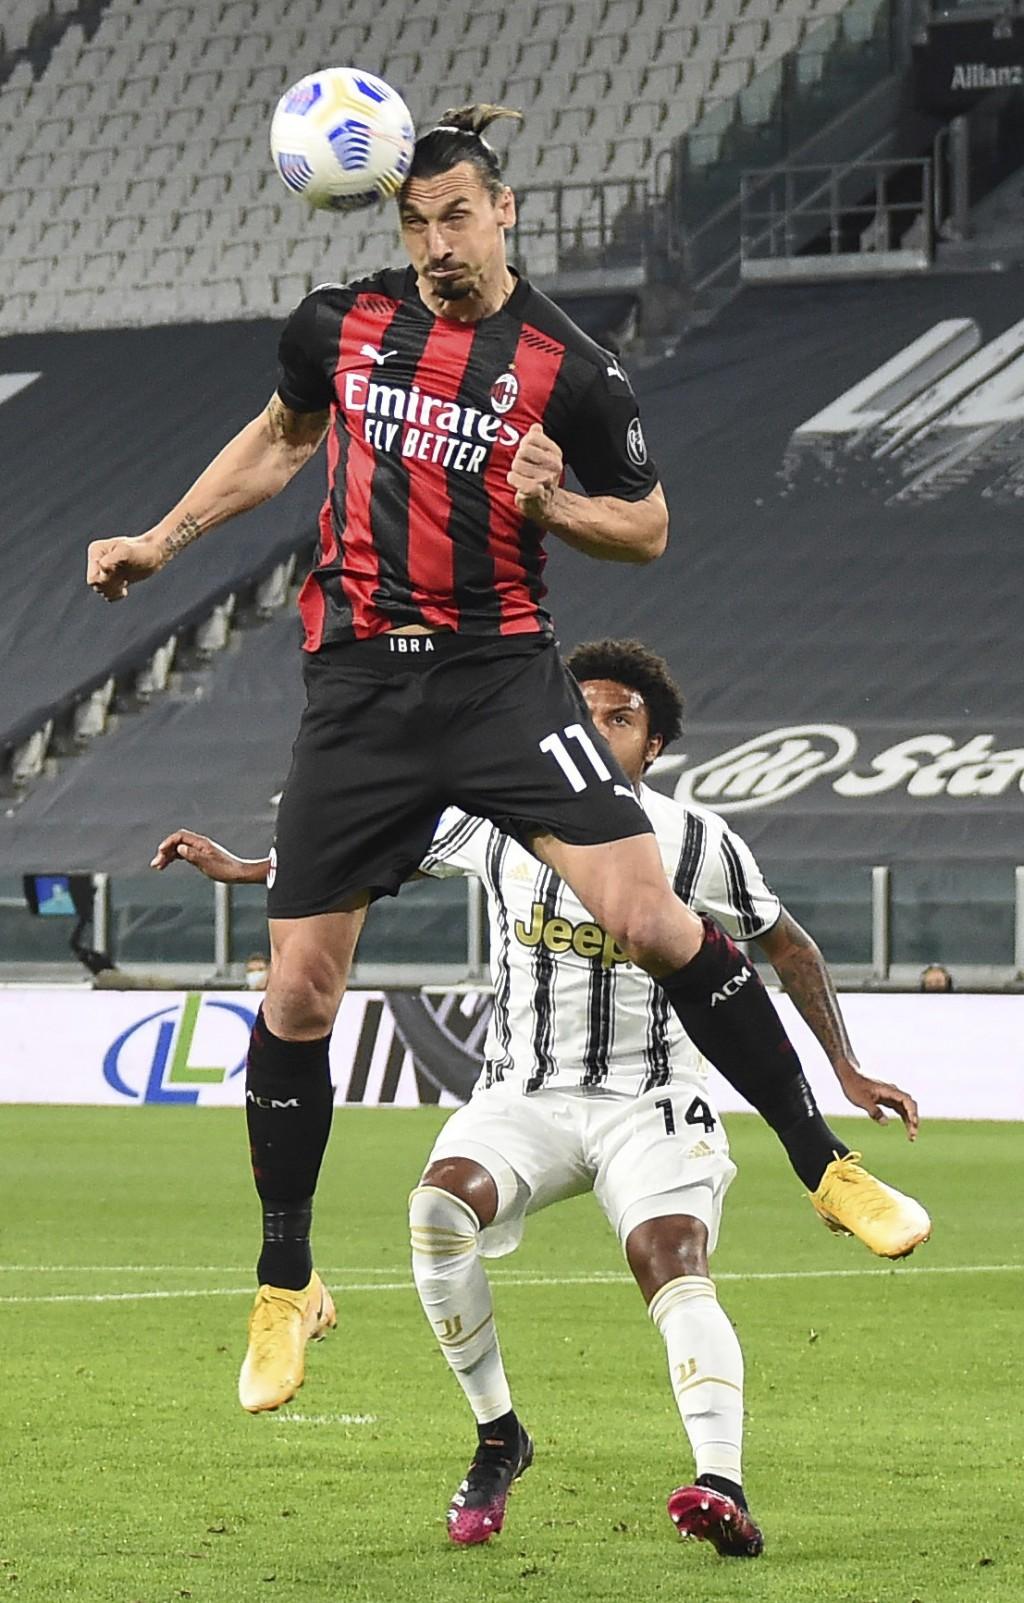 Milan's Zlatan Ibrahimovic in action during the Italian Serie A soccer match between Juventus and Milan, at the Juventus Stadium, in Turin, Italy, Sun...